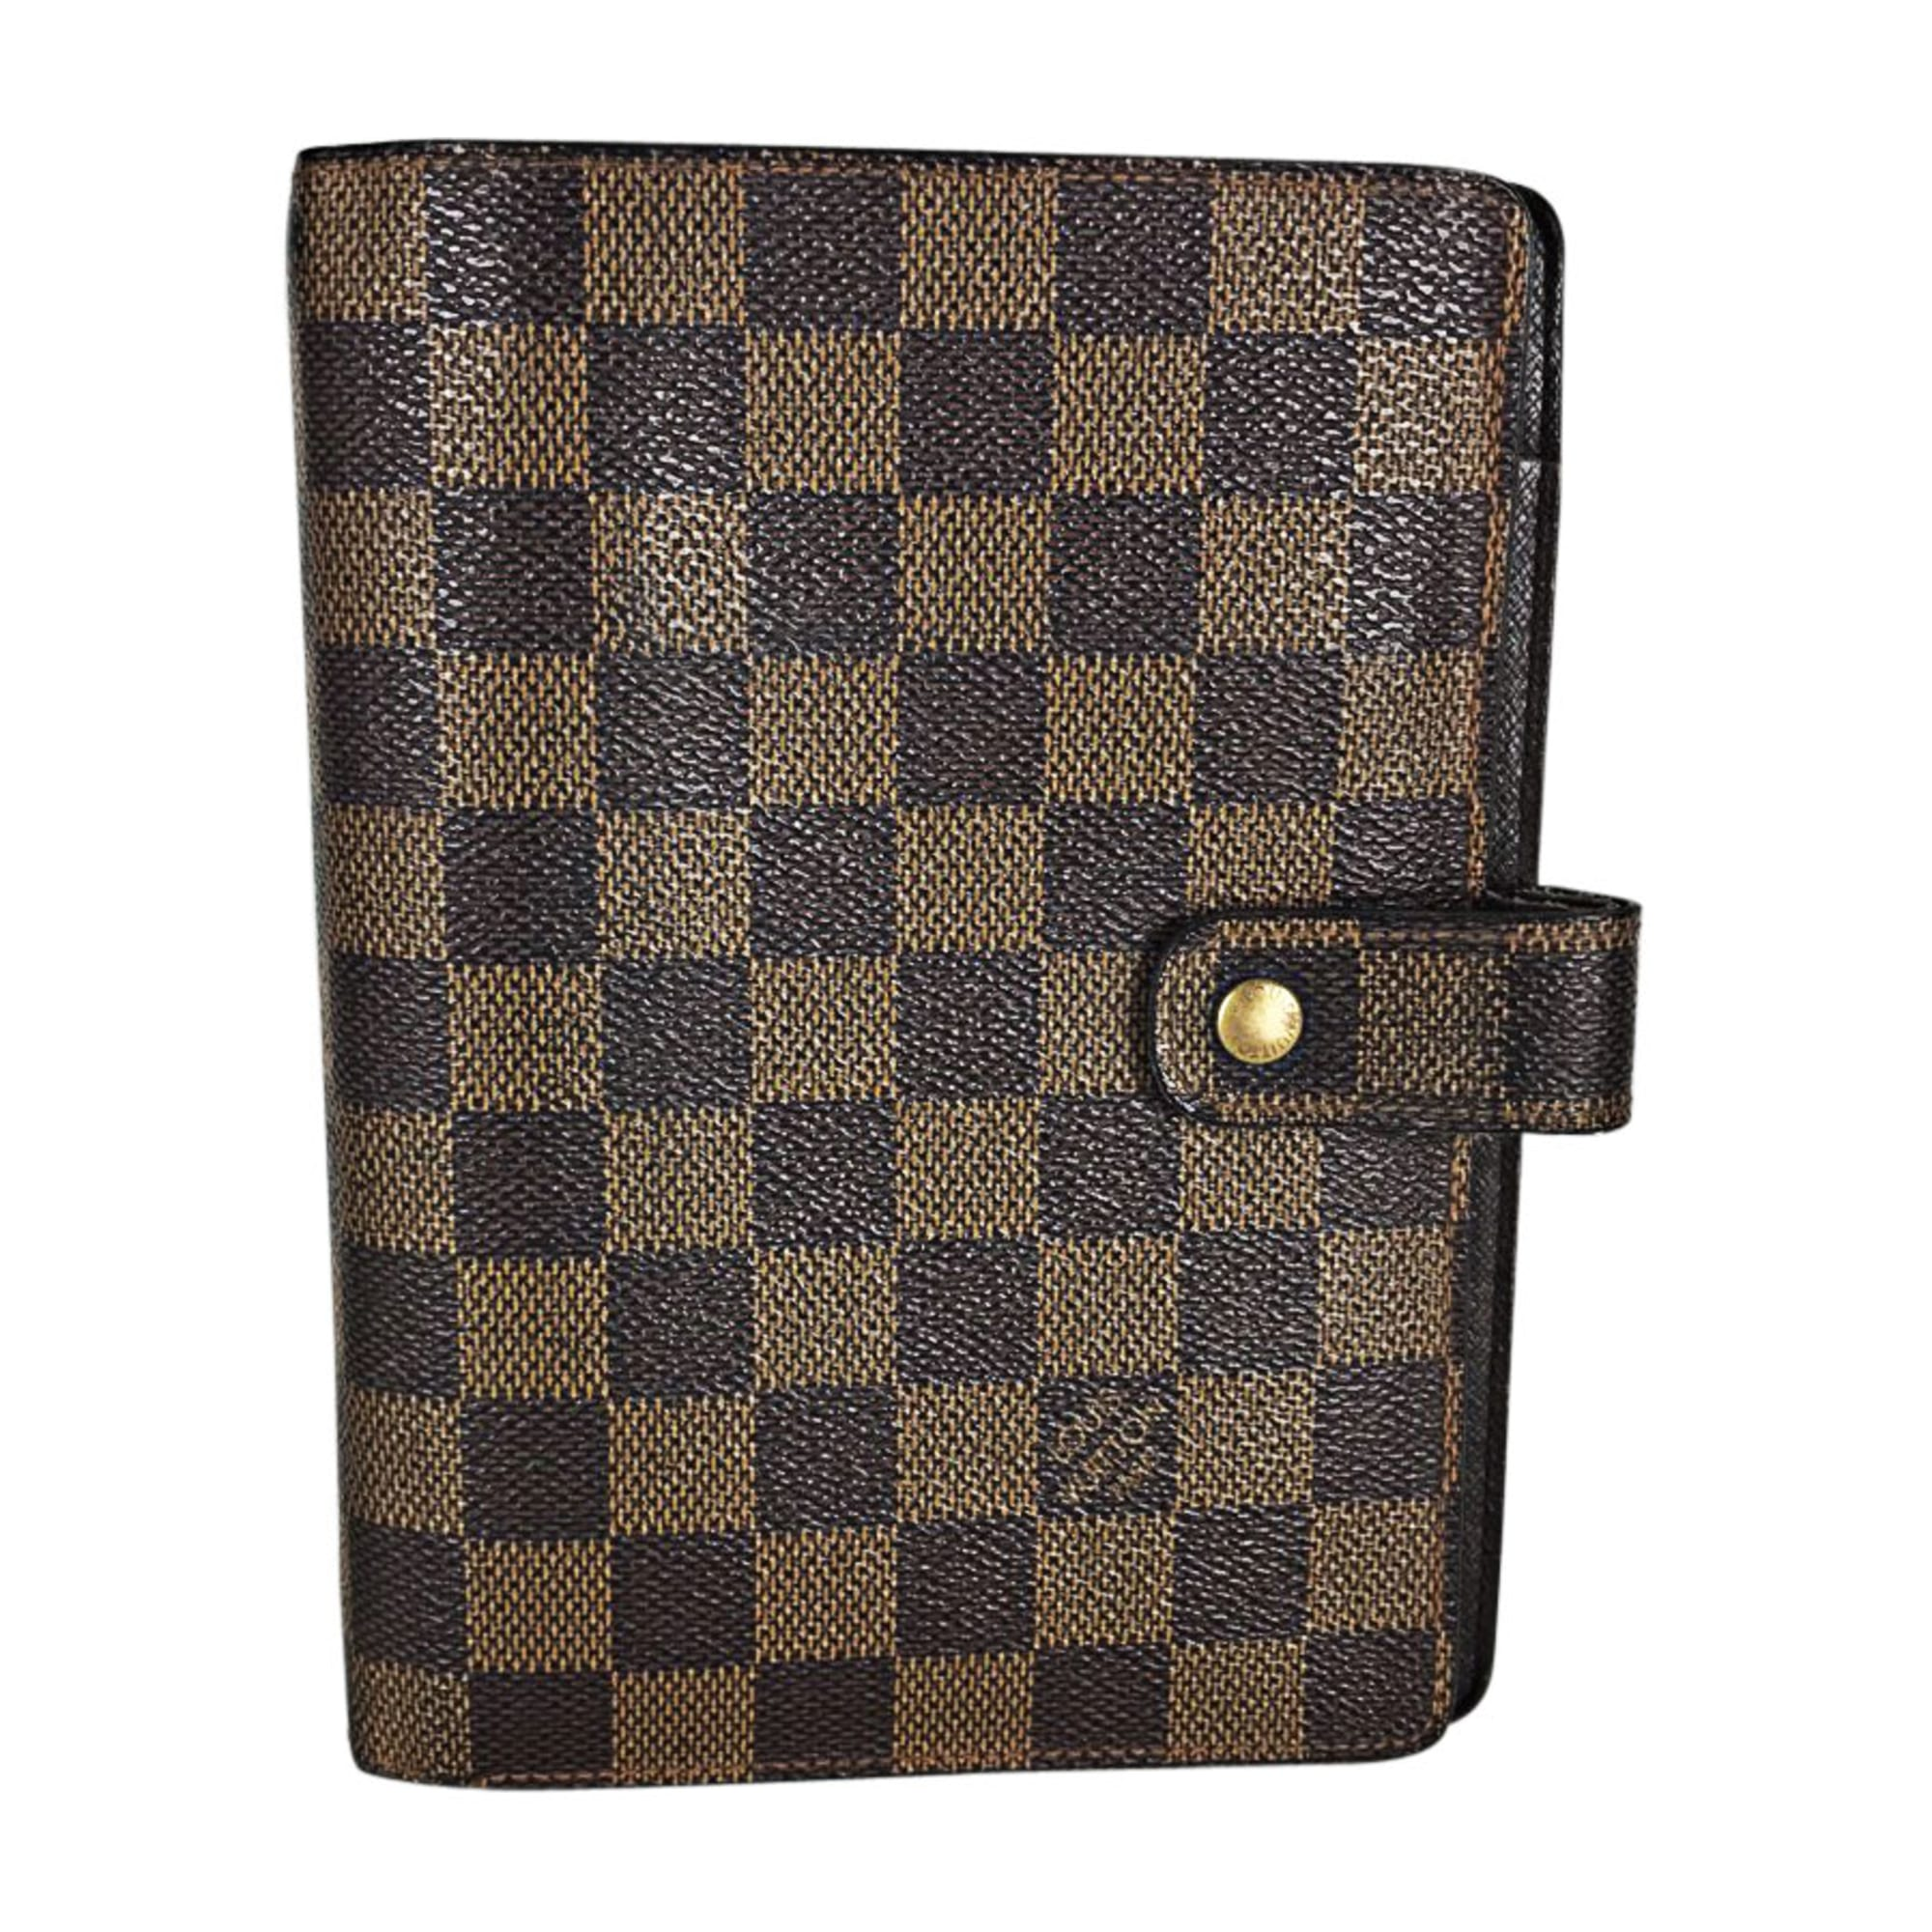 Sac pochette en cuir LOUIS VUITTON marron - 7271580 bca47e62bc7